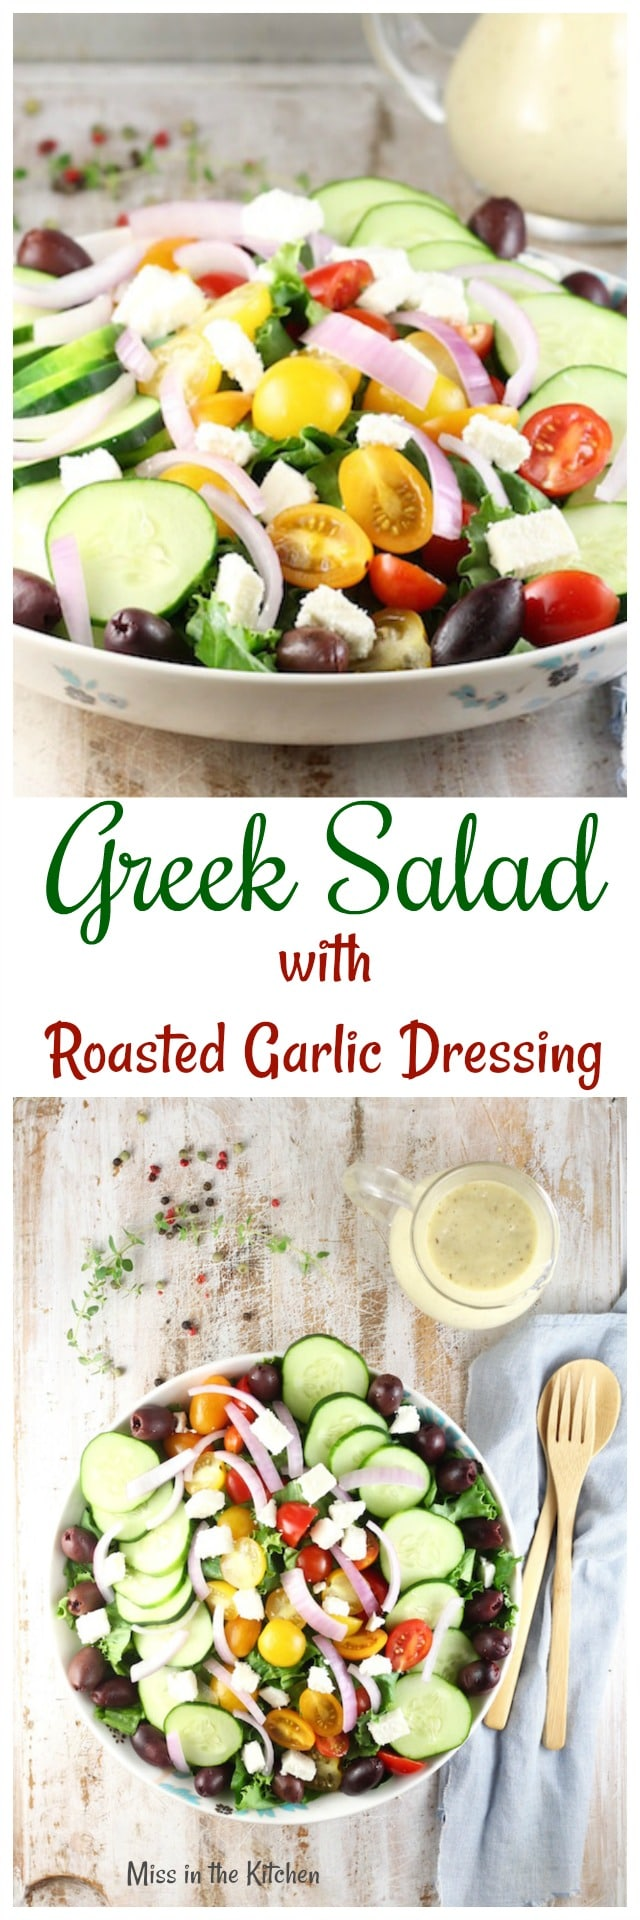 Greek Salad with Roasted Garlic Salad Dressing Recipe from MissintheKitchen.com